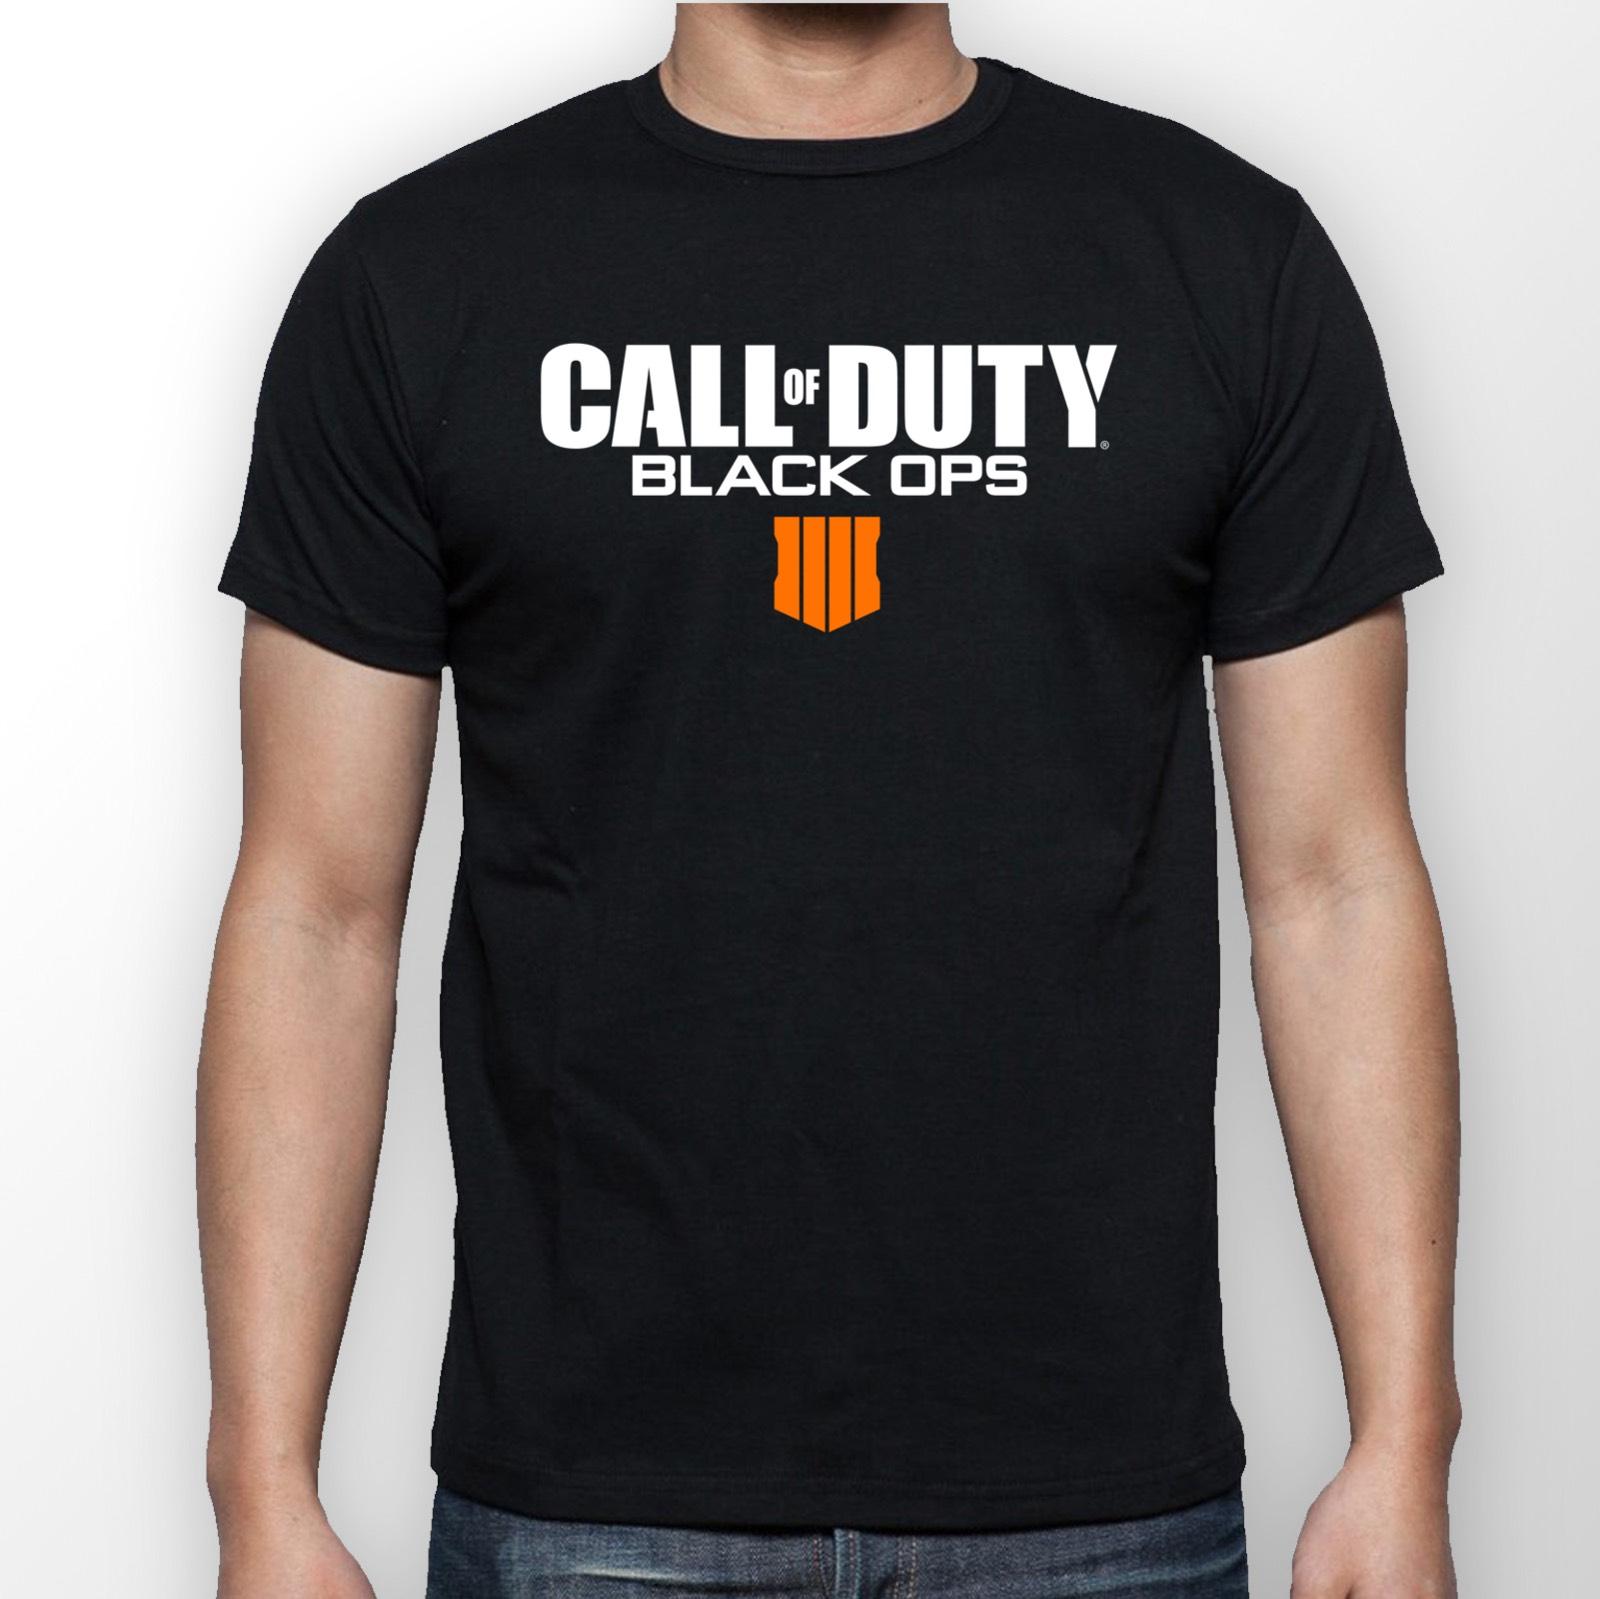 Call of Duty Black Ops 4 tee shirt - £3 instore @ Tesco